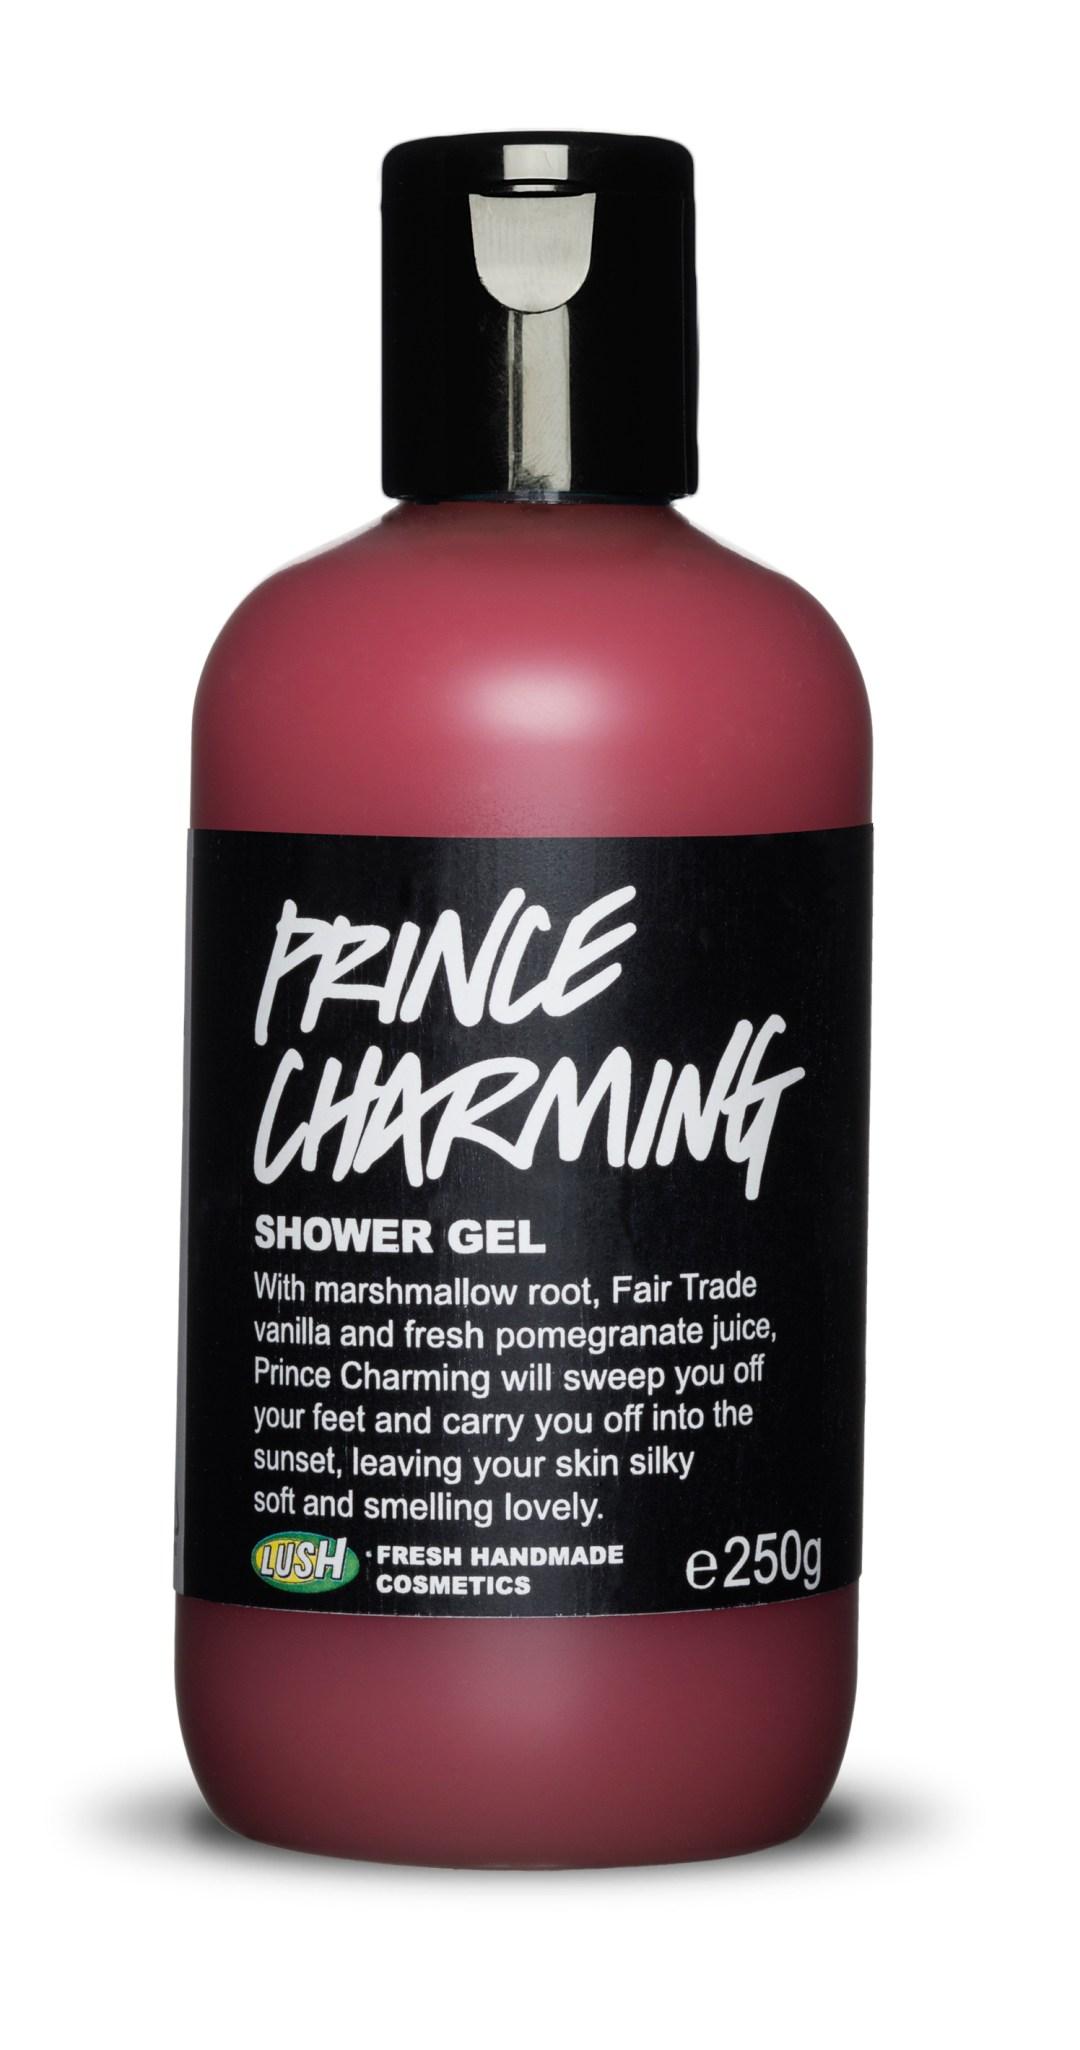 Prince Charming shower gel